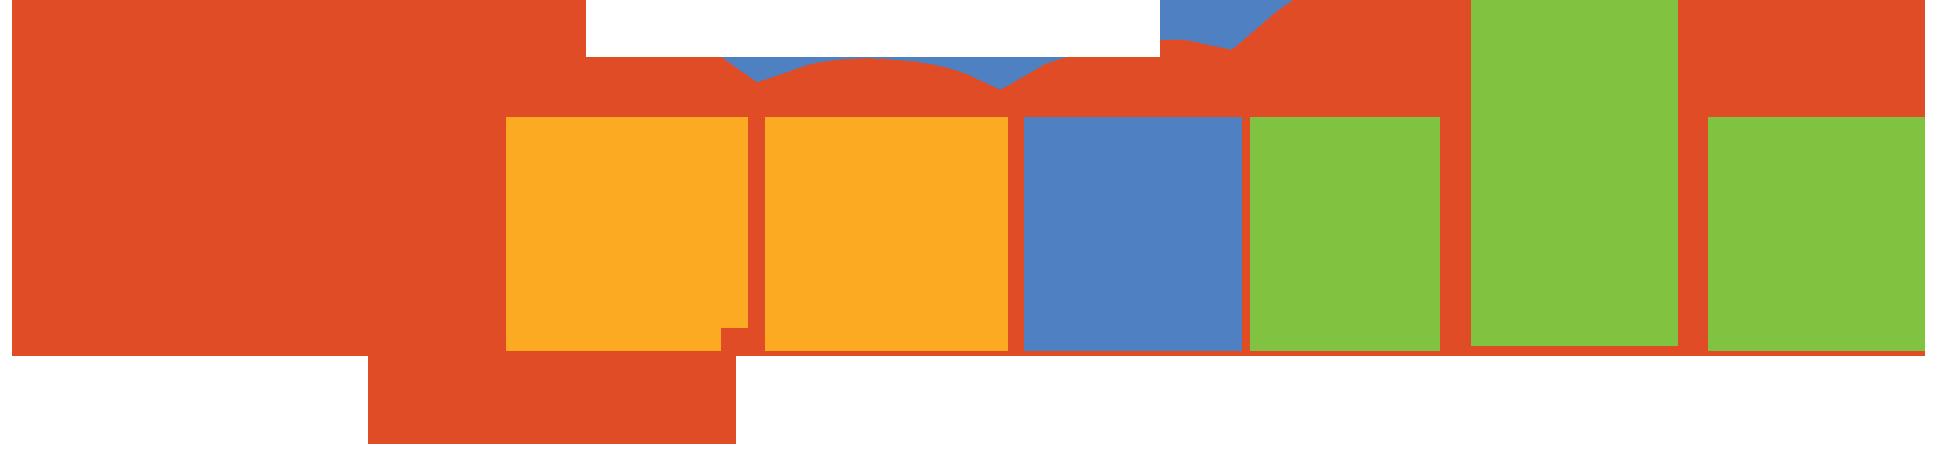 Sqooasha logo small